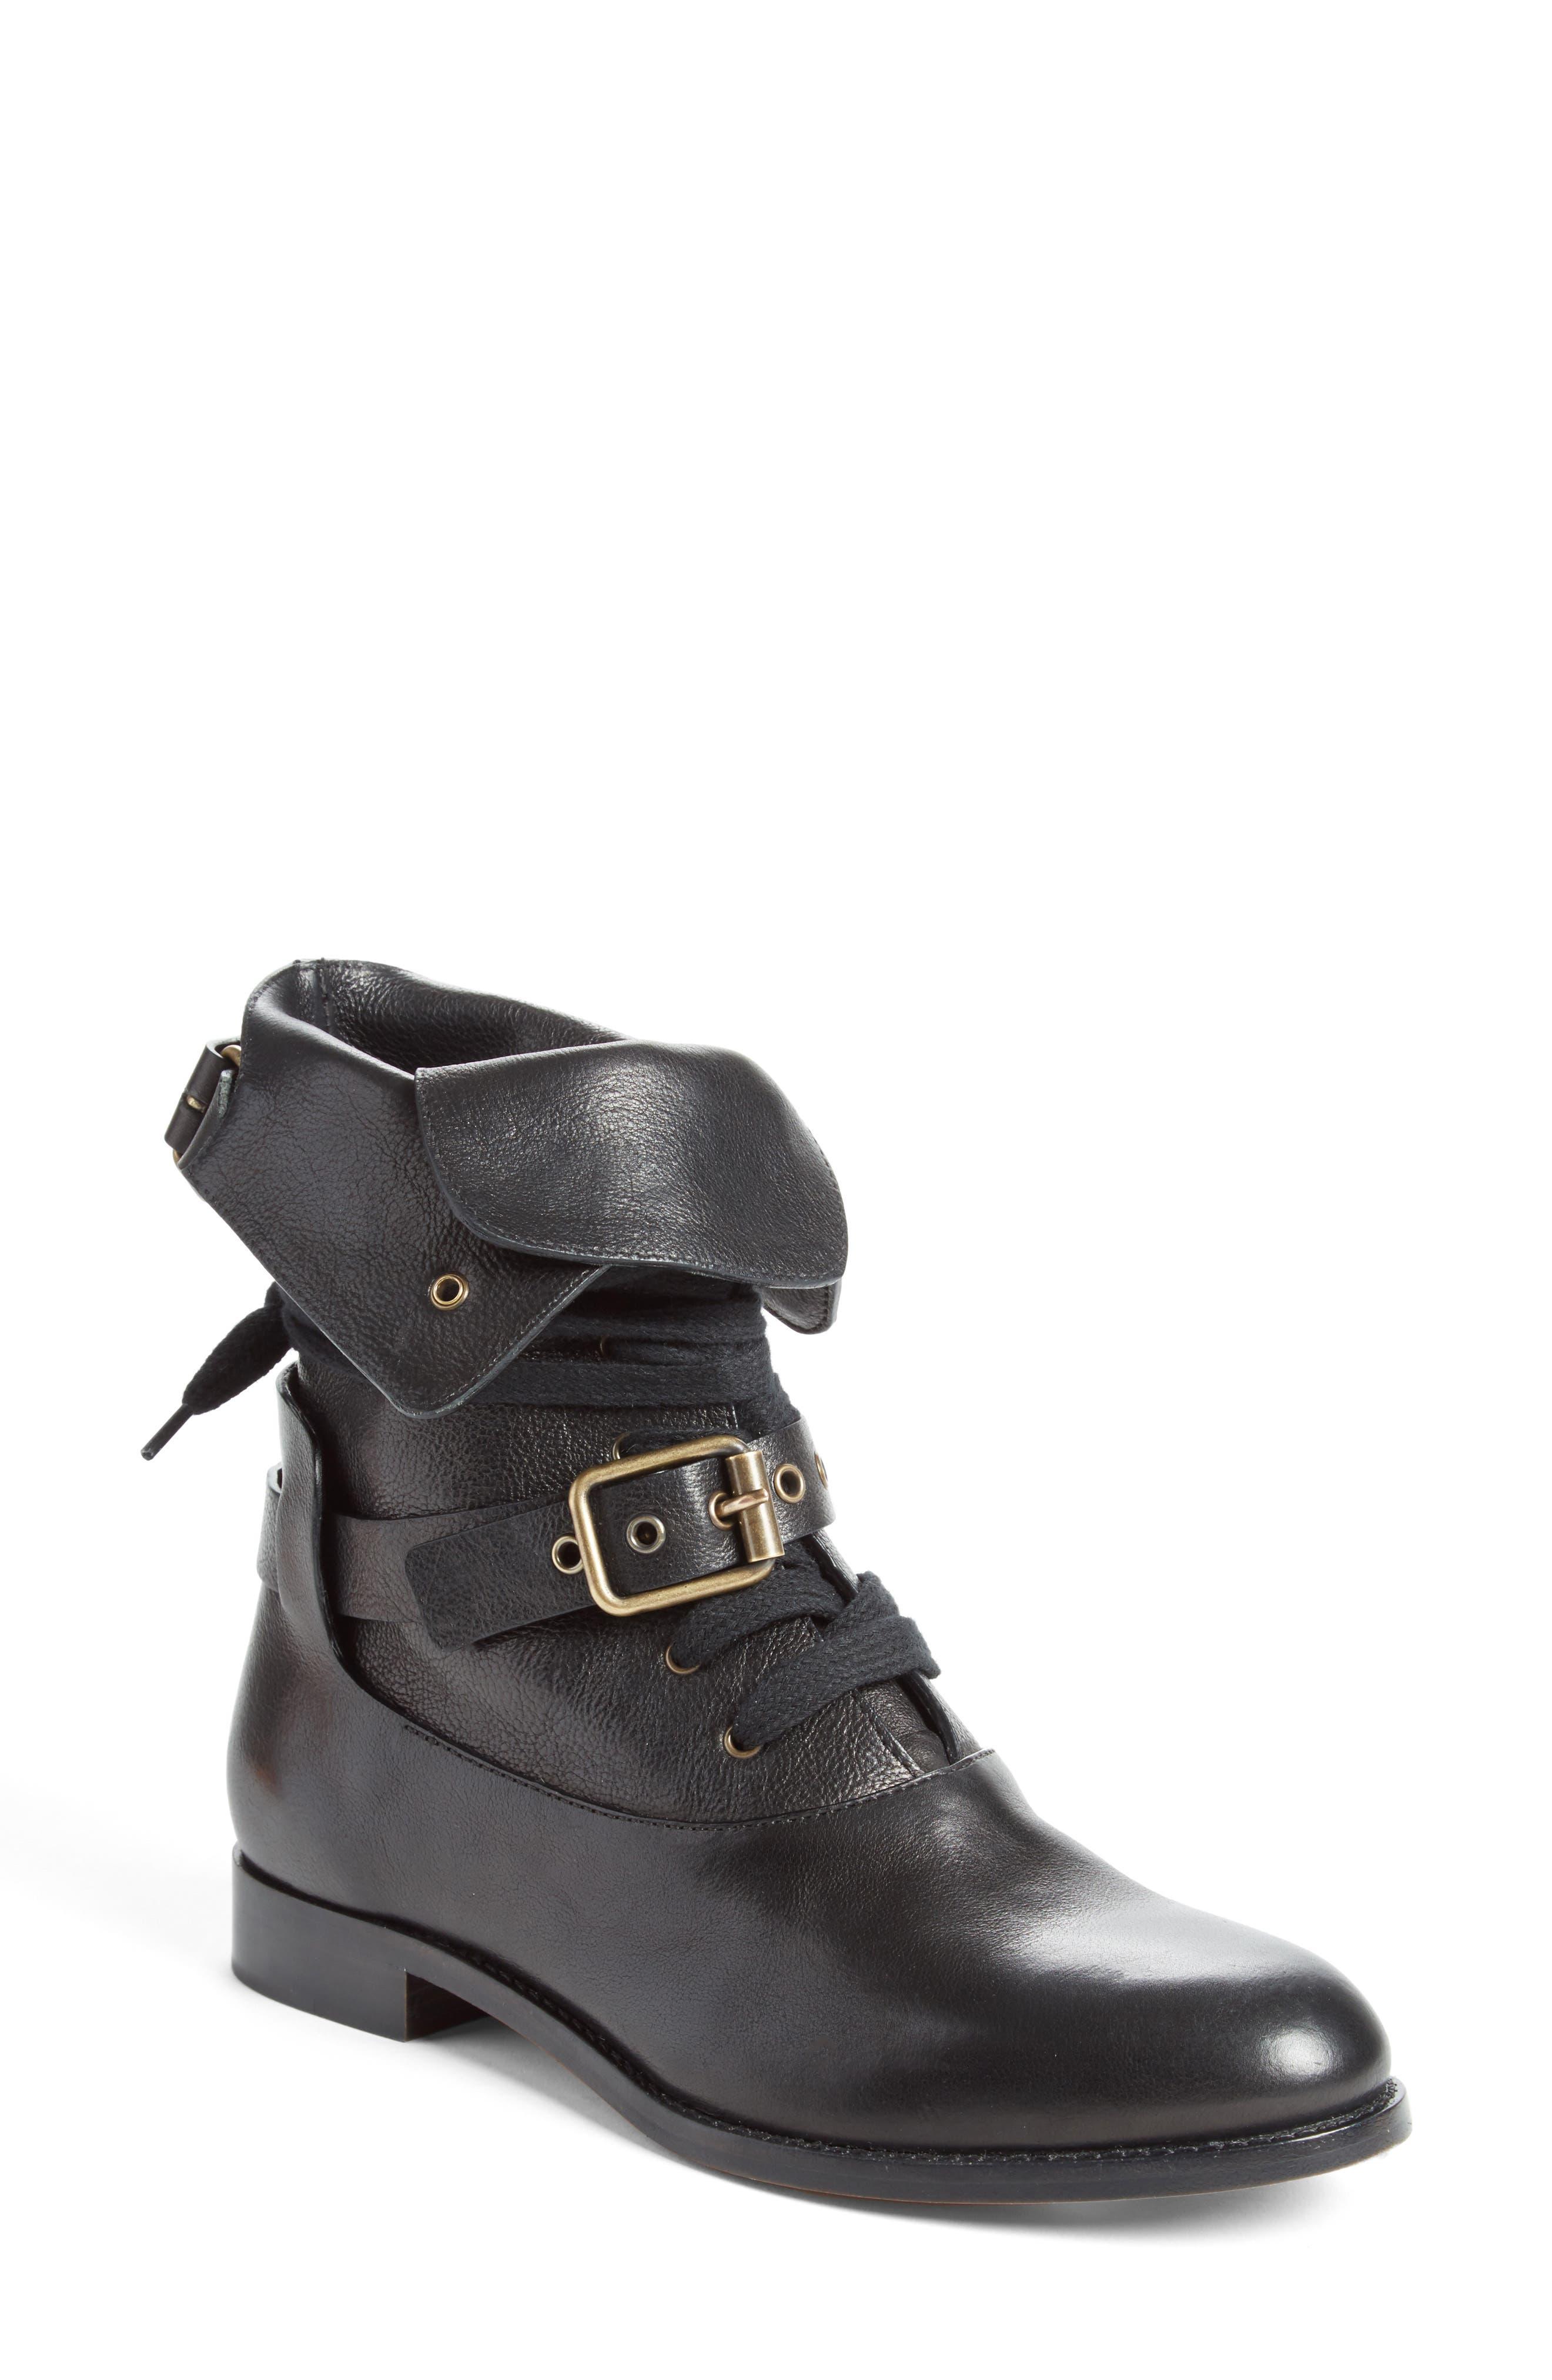 Otto Convertible Boot,                         Main,                         color,